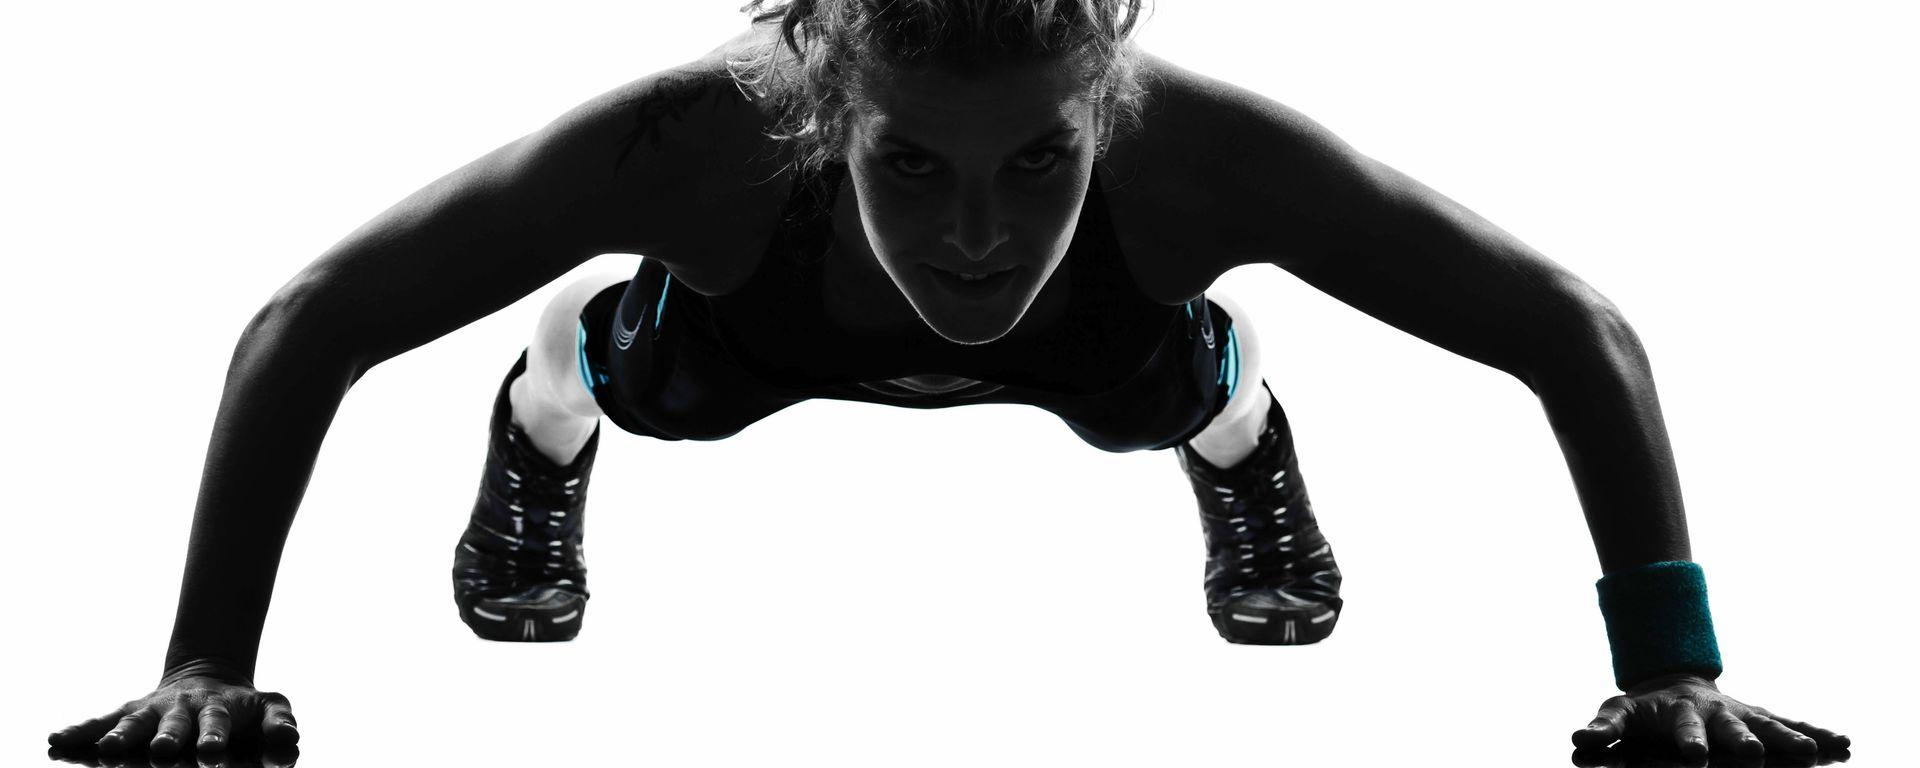 bigstock-woman-workout-fitness-posture-21838448-fitness